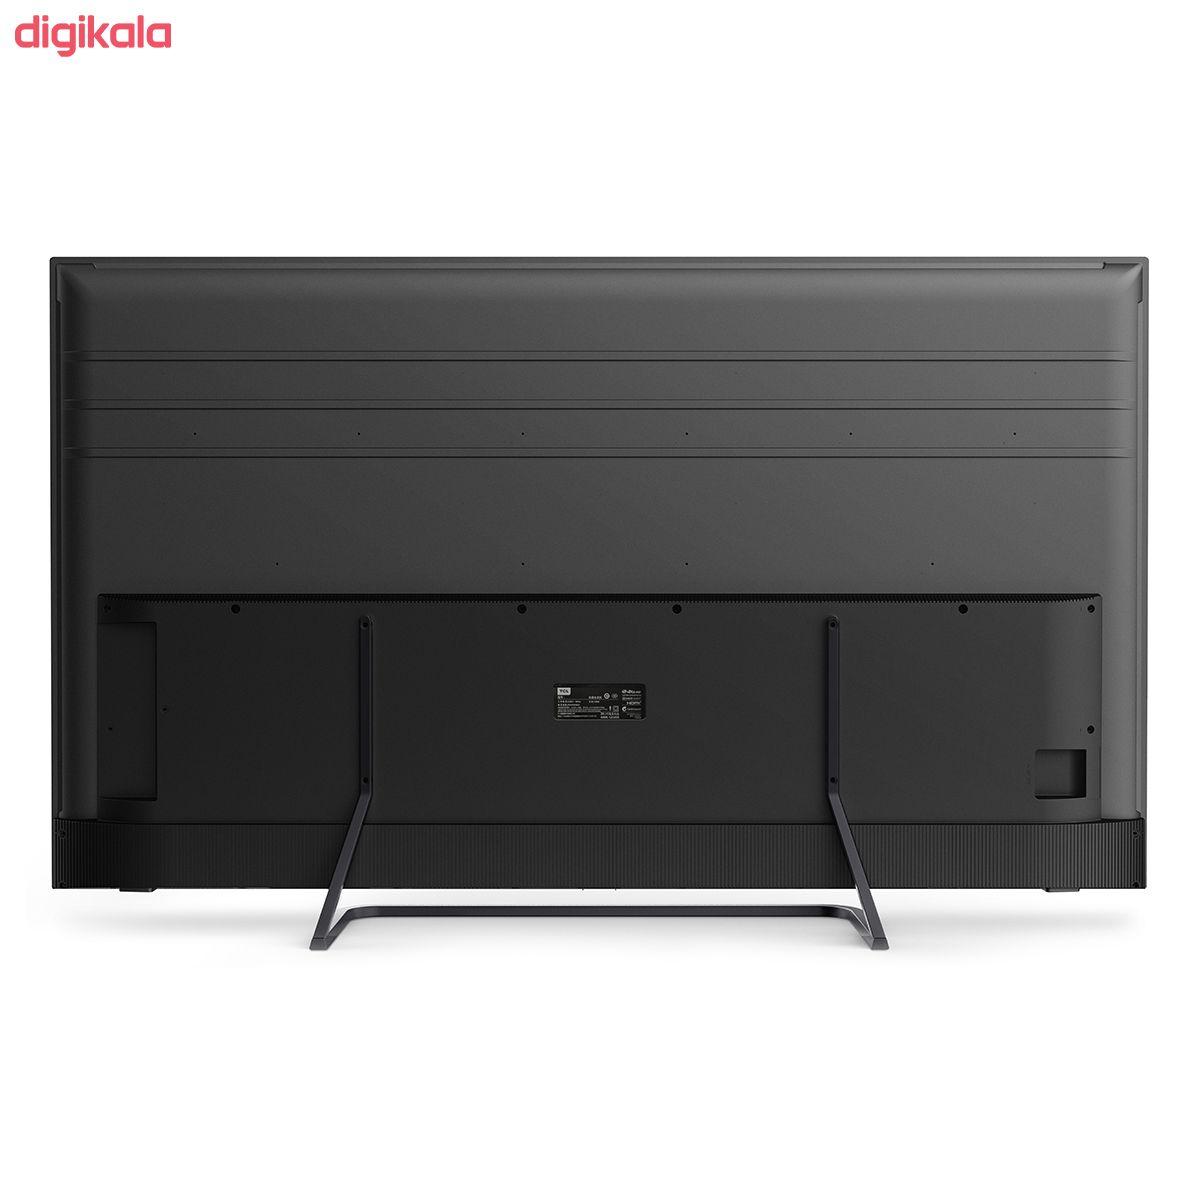 تلویزیون ال ای دی هوشمند تی سی ال مدل 55P8SA سایز 55 اینچ main 1 3